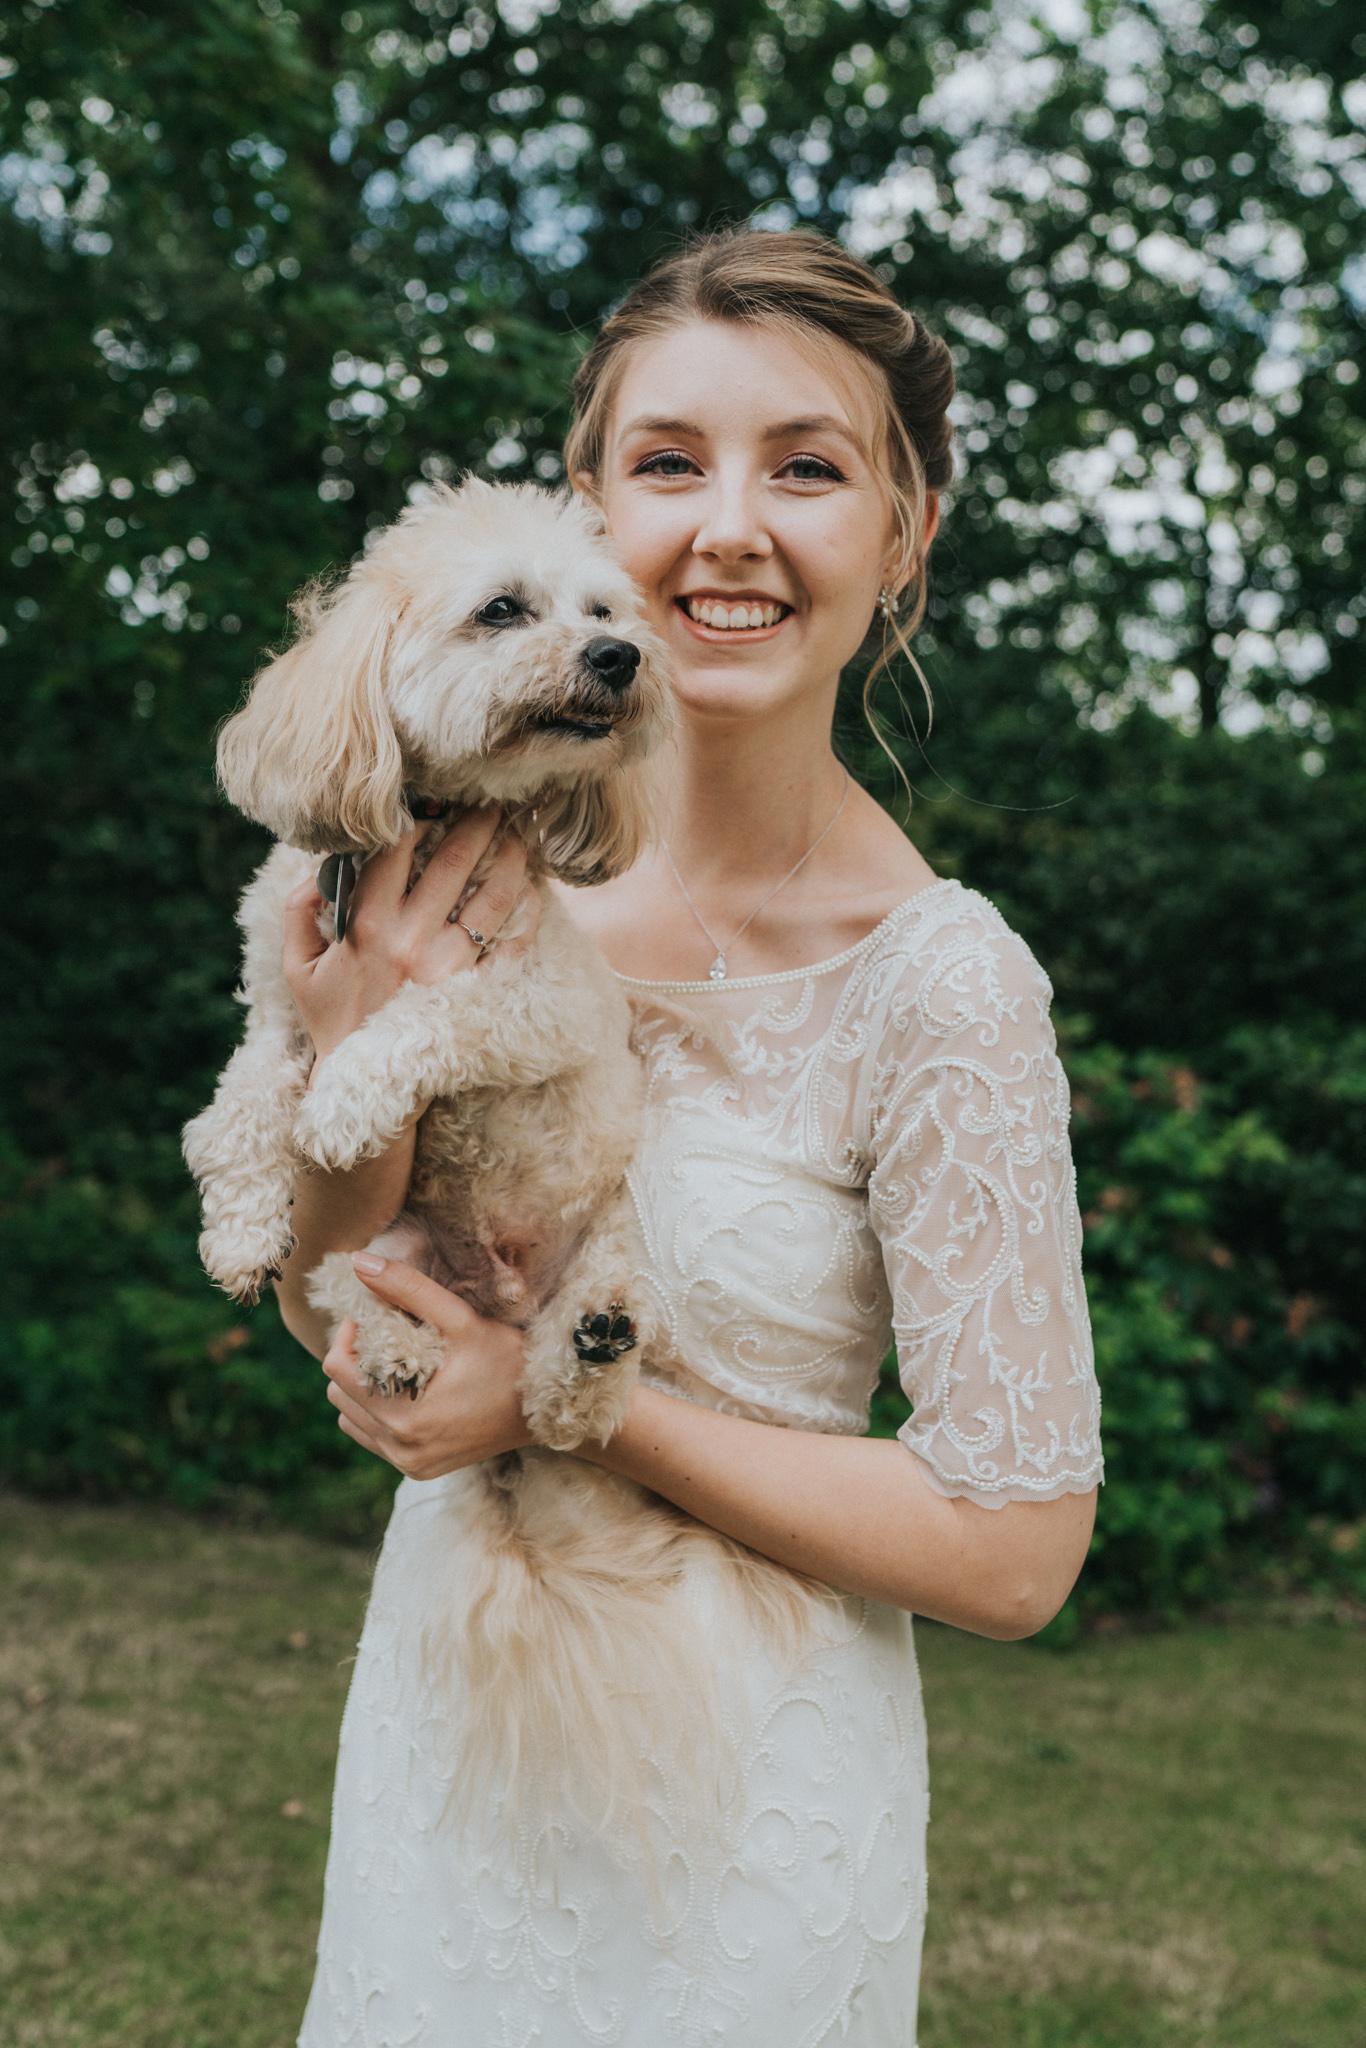 Jess-and-Tom-Norfolk-Alternative-Wedding-Essex-Wedding-Photographer-Grace-Elizabeth-9.jpg